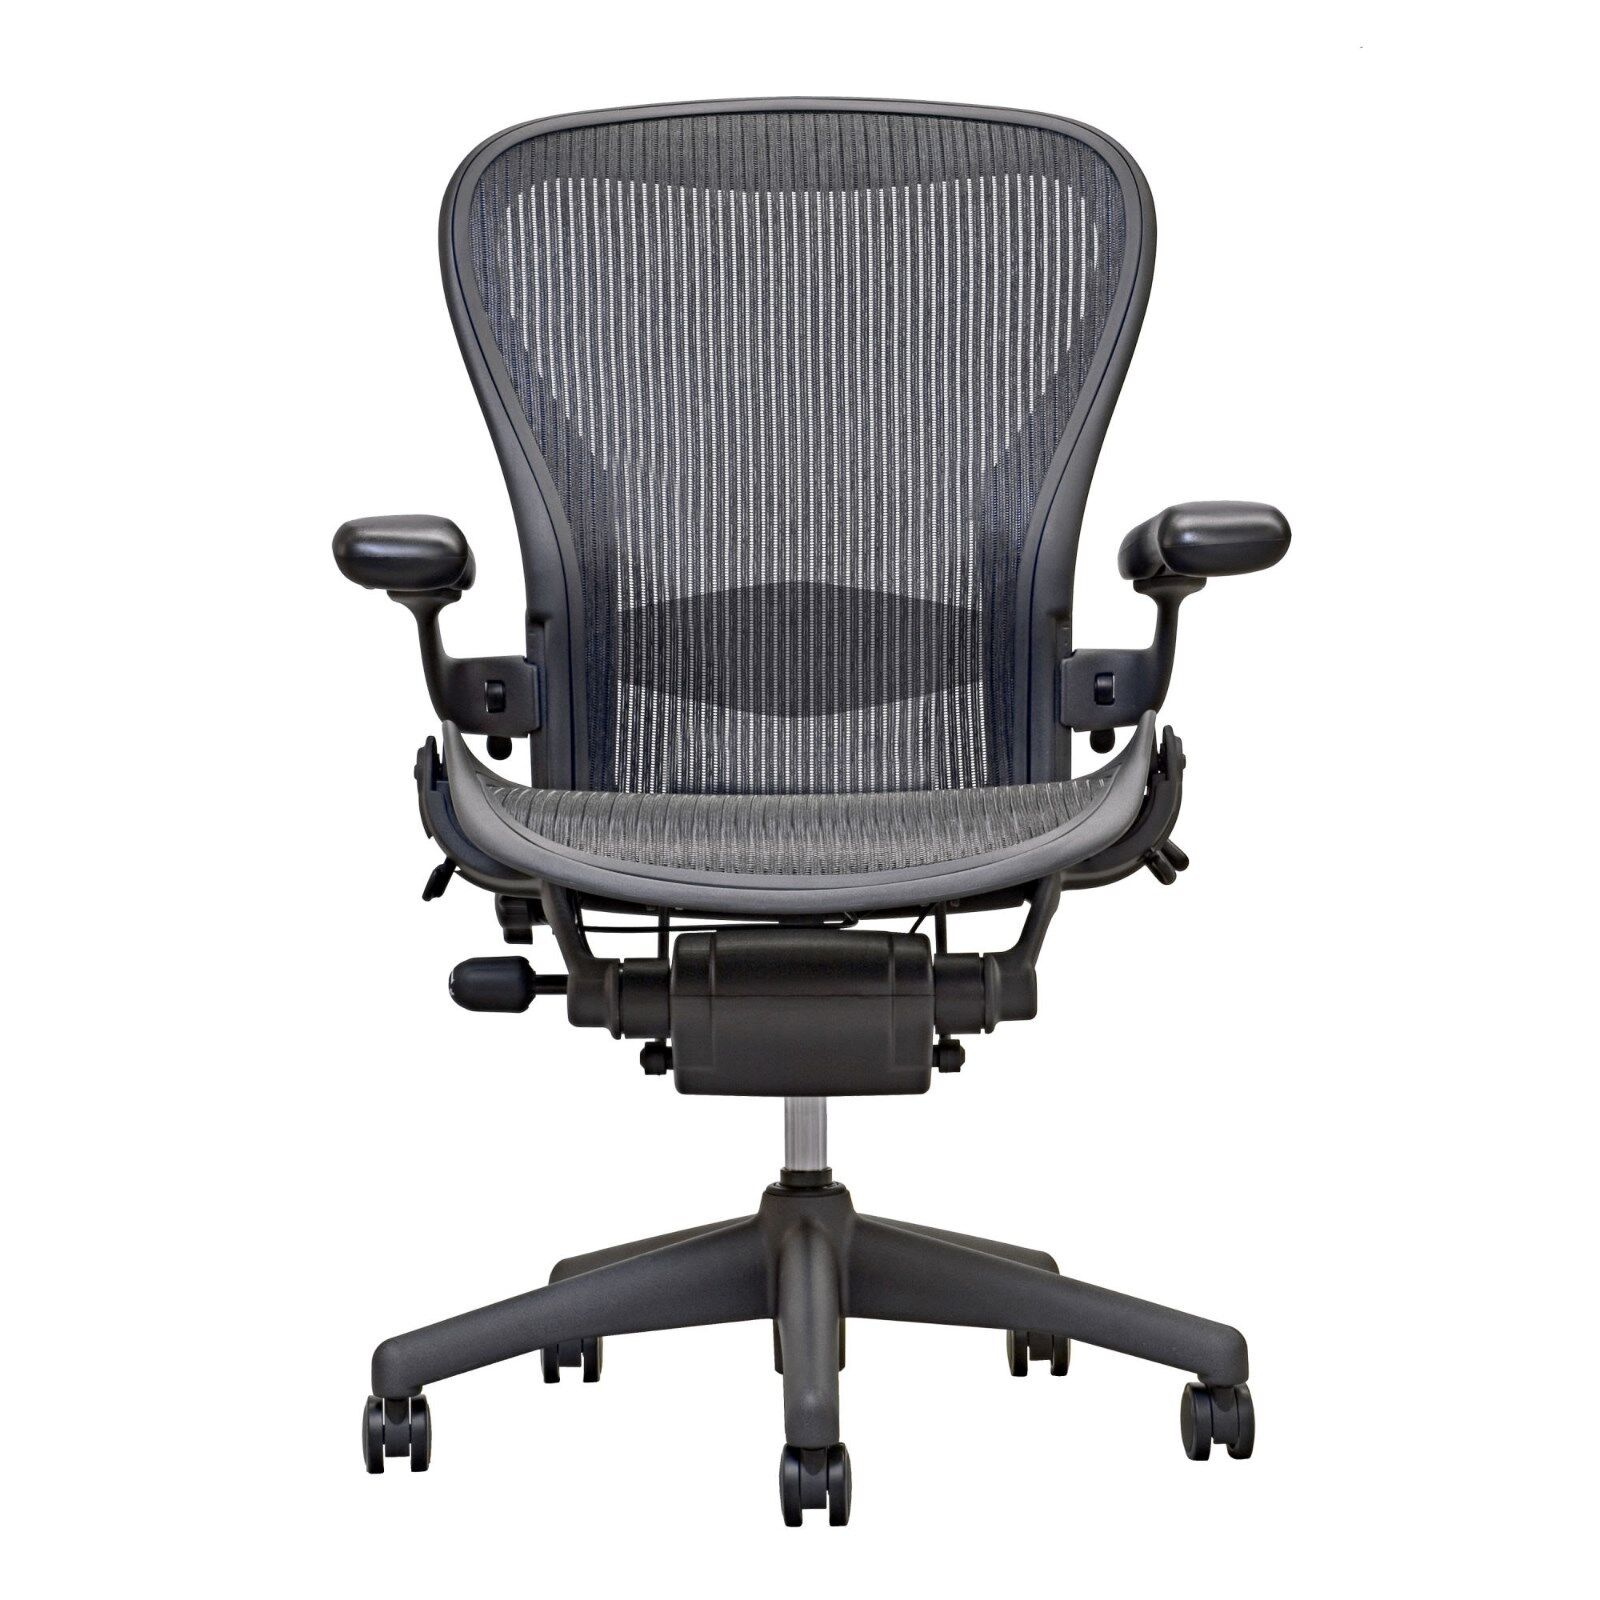 Orthopedic fice Chairs